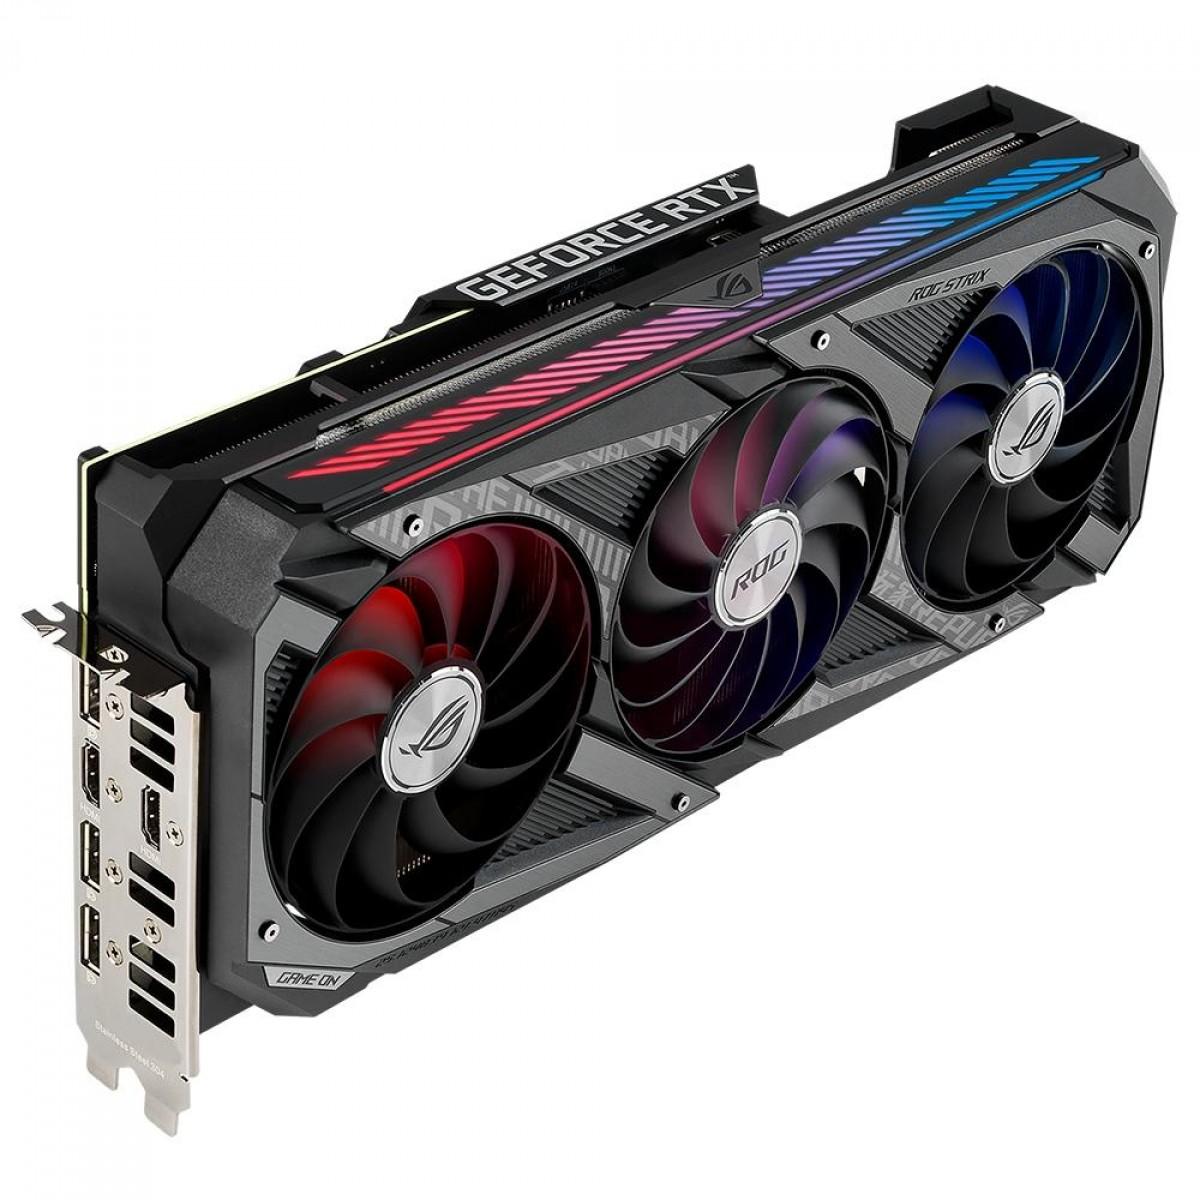 Placa de Vídeo Asus, ROG Strix, Geforce RTX 3060 Ti, LHR, V2, 8GB, GDDR6, DLSS, Ray Tracing, ROG-STRIX-RTX3060TI-8G-V2-GAMING